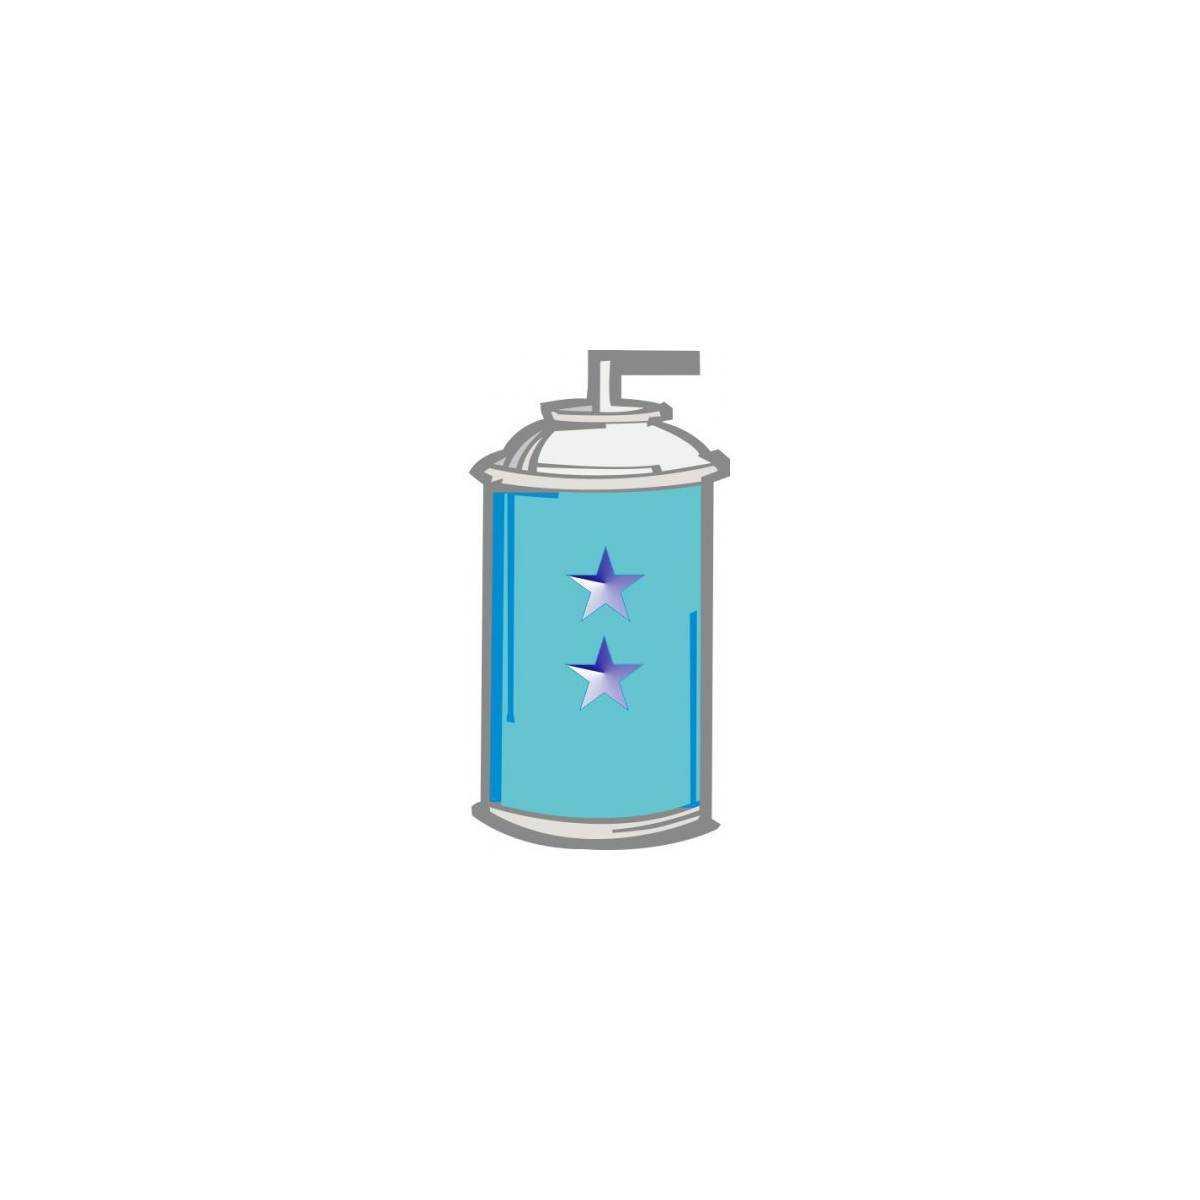 Аэрозольный баллончик 250мл, Греция (WHITE SATIN) 12-04-0025 Атма